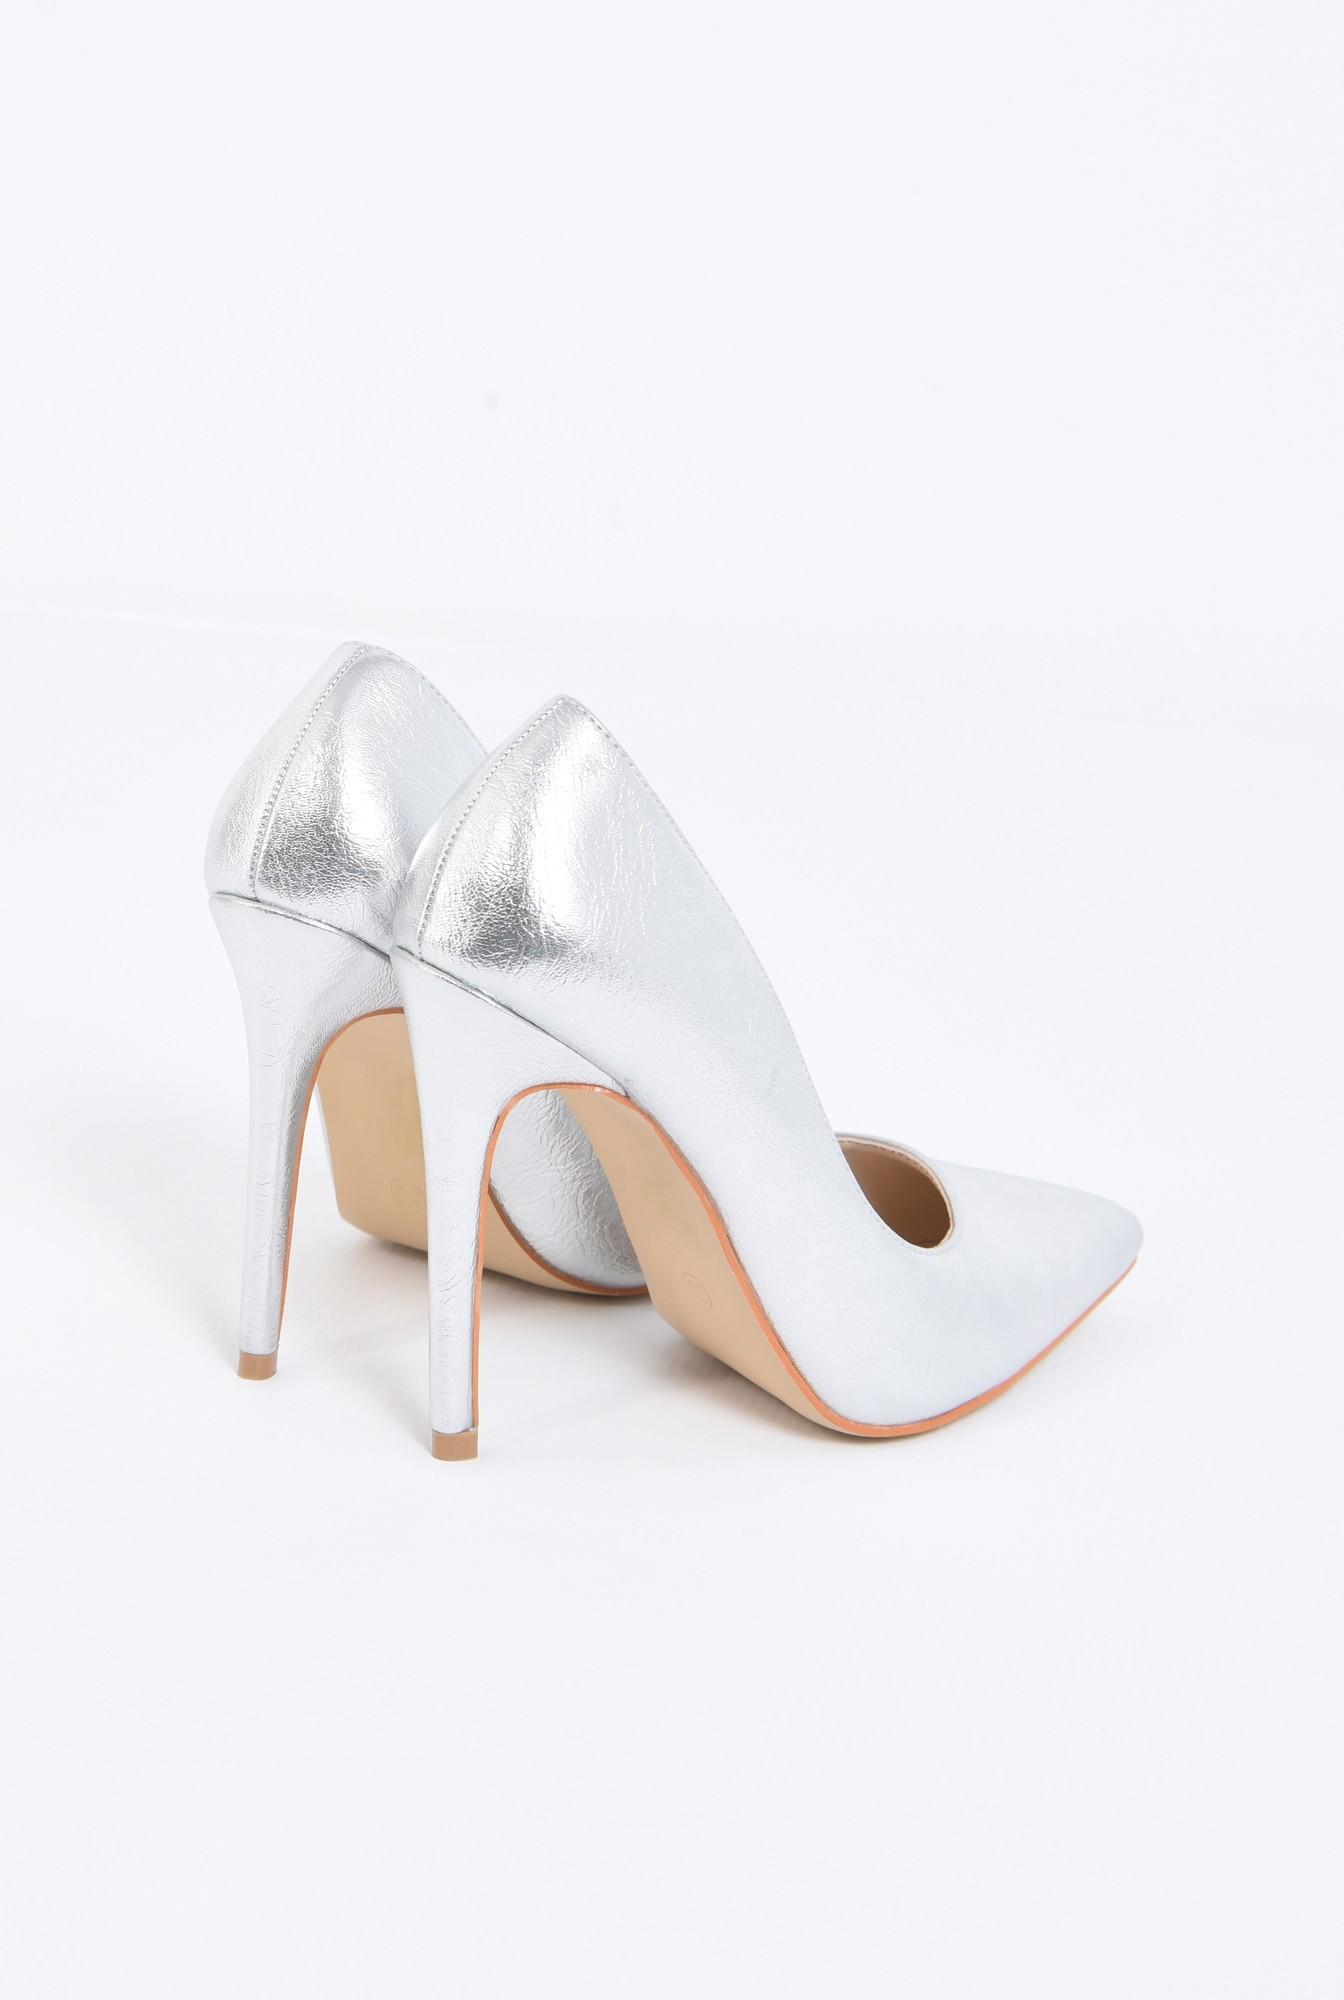 2 - pantofi dama, stiletto, argintiu, metalic